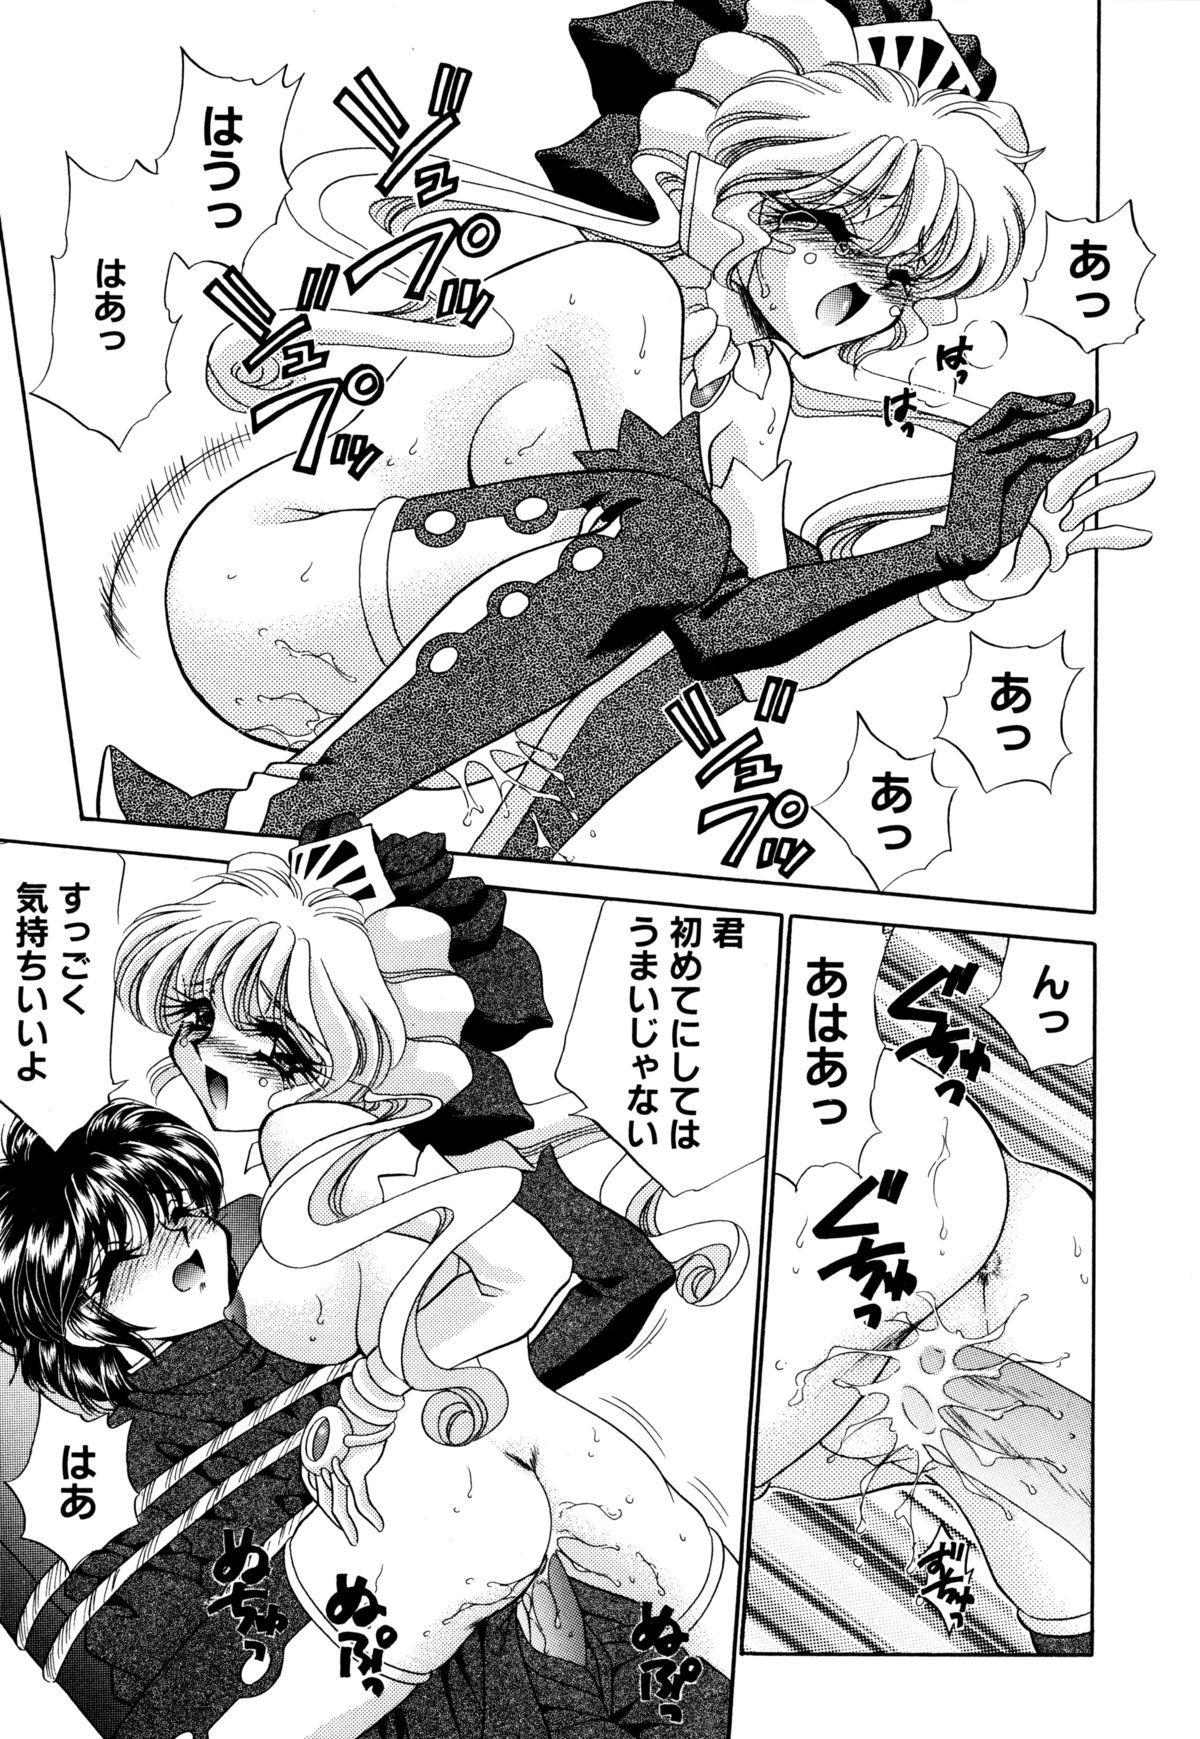 Kigurumi Sentai Quiltian 181